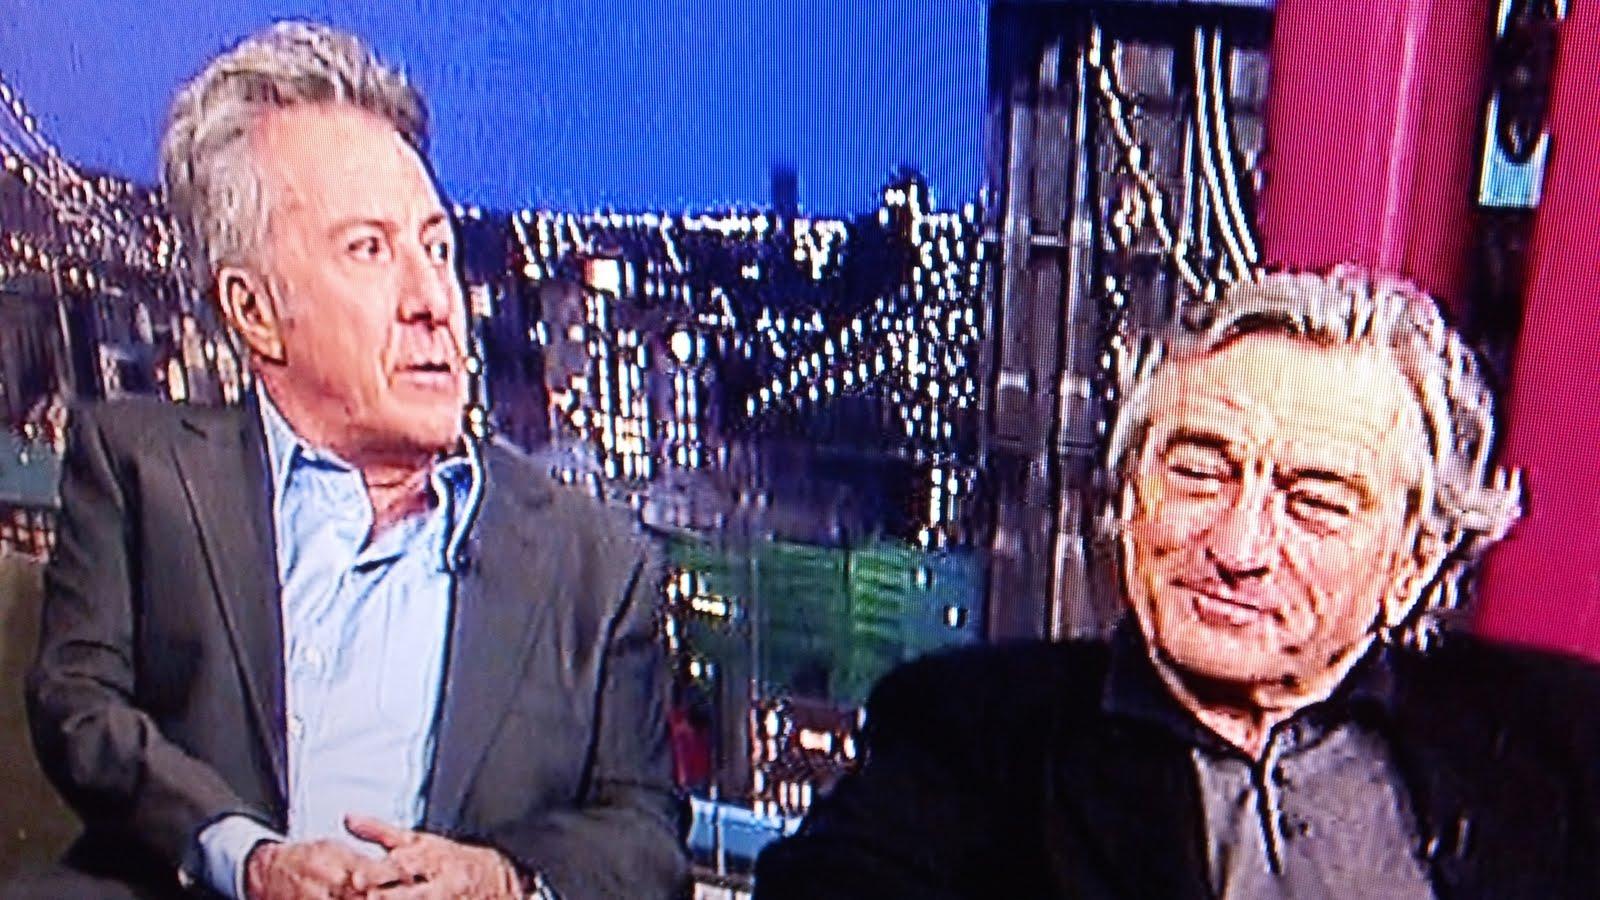 Dustin Hoffman was a guest on, David Letterman